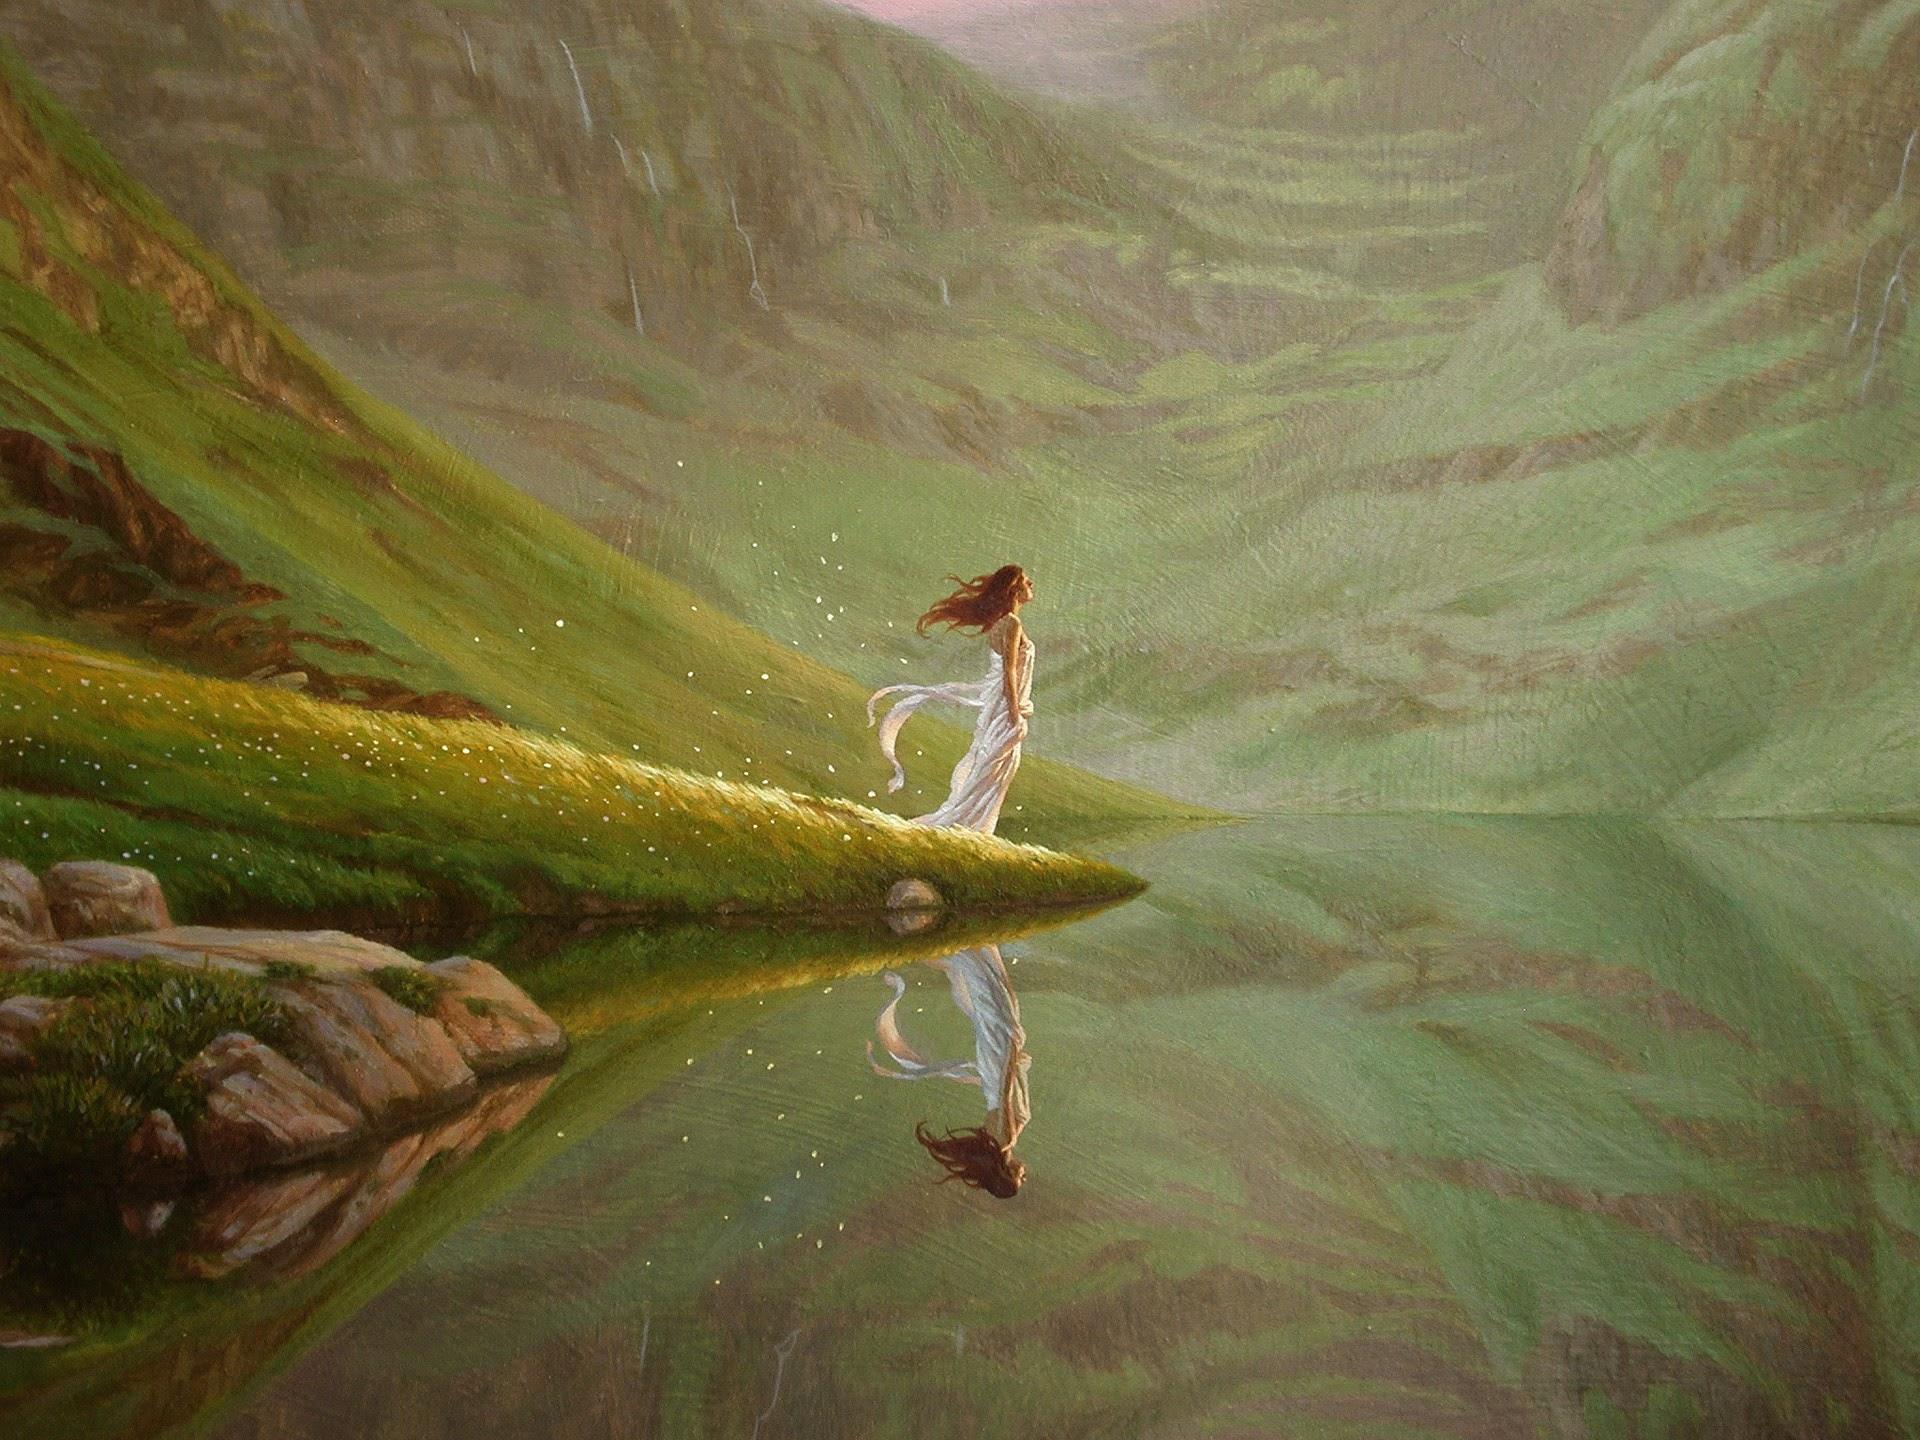 Christophe Vacher Vision at the lake